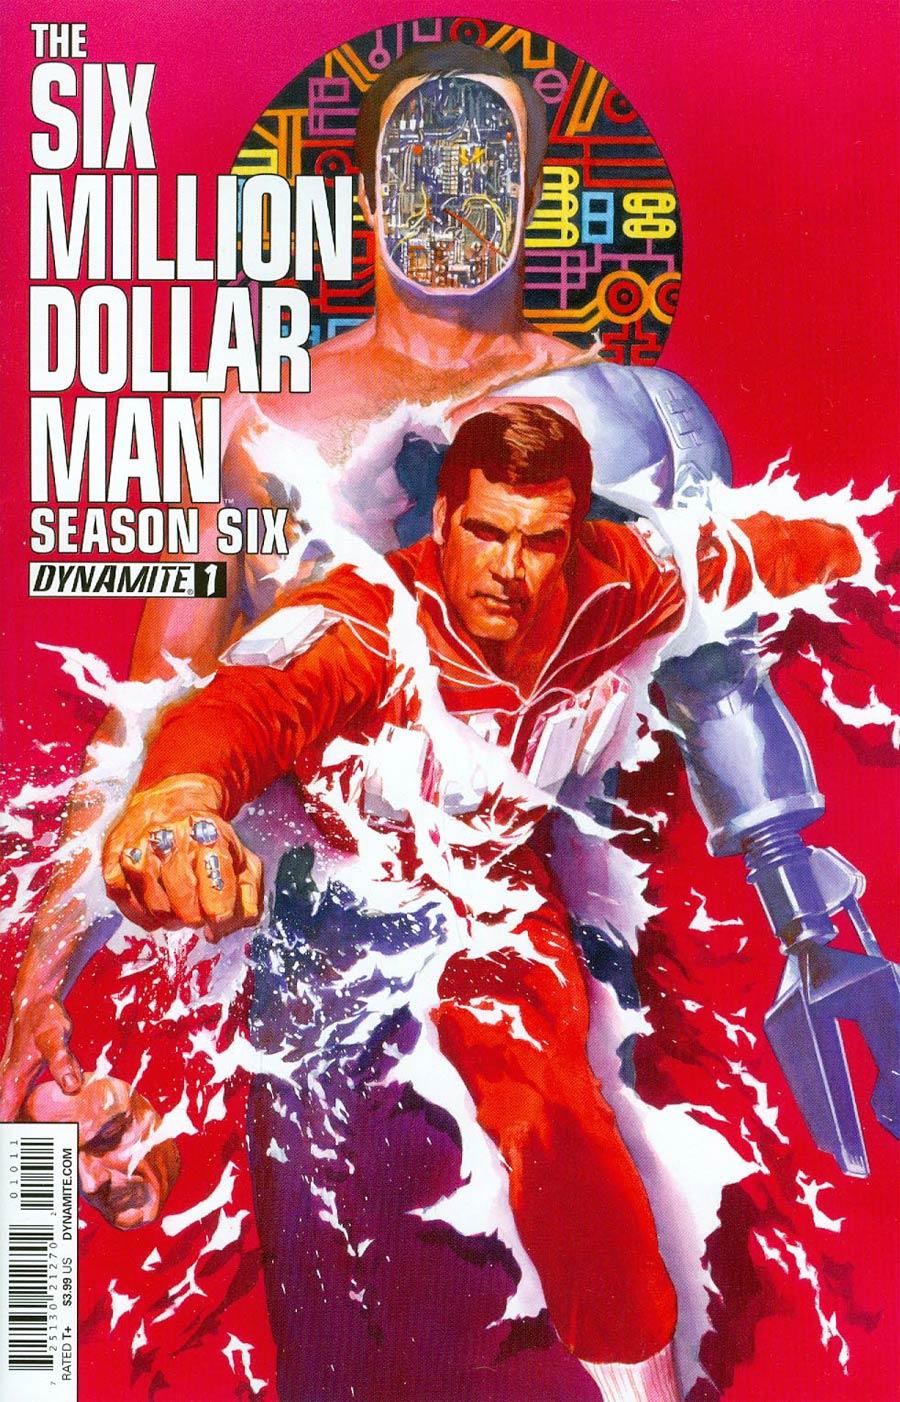 Six Million Dollar Man Season 6 #1 Cover A 1st Ptg Regular Alex Ross Cover